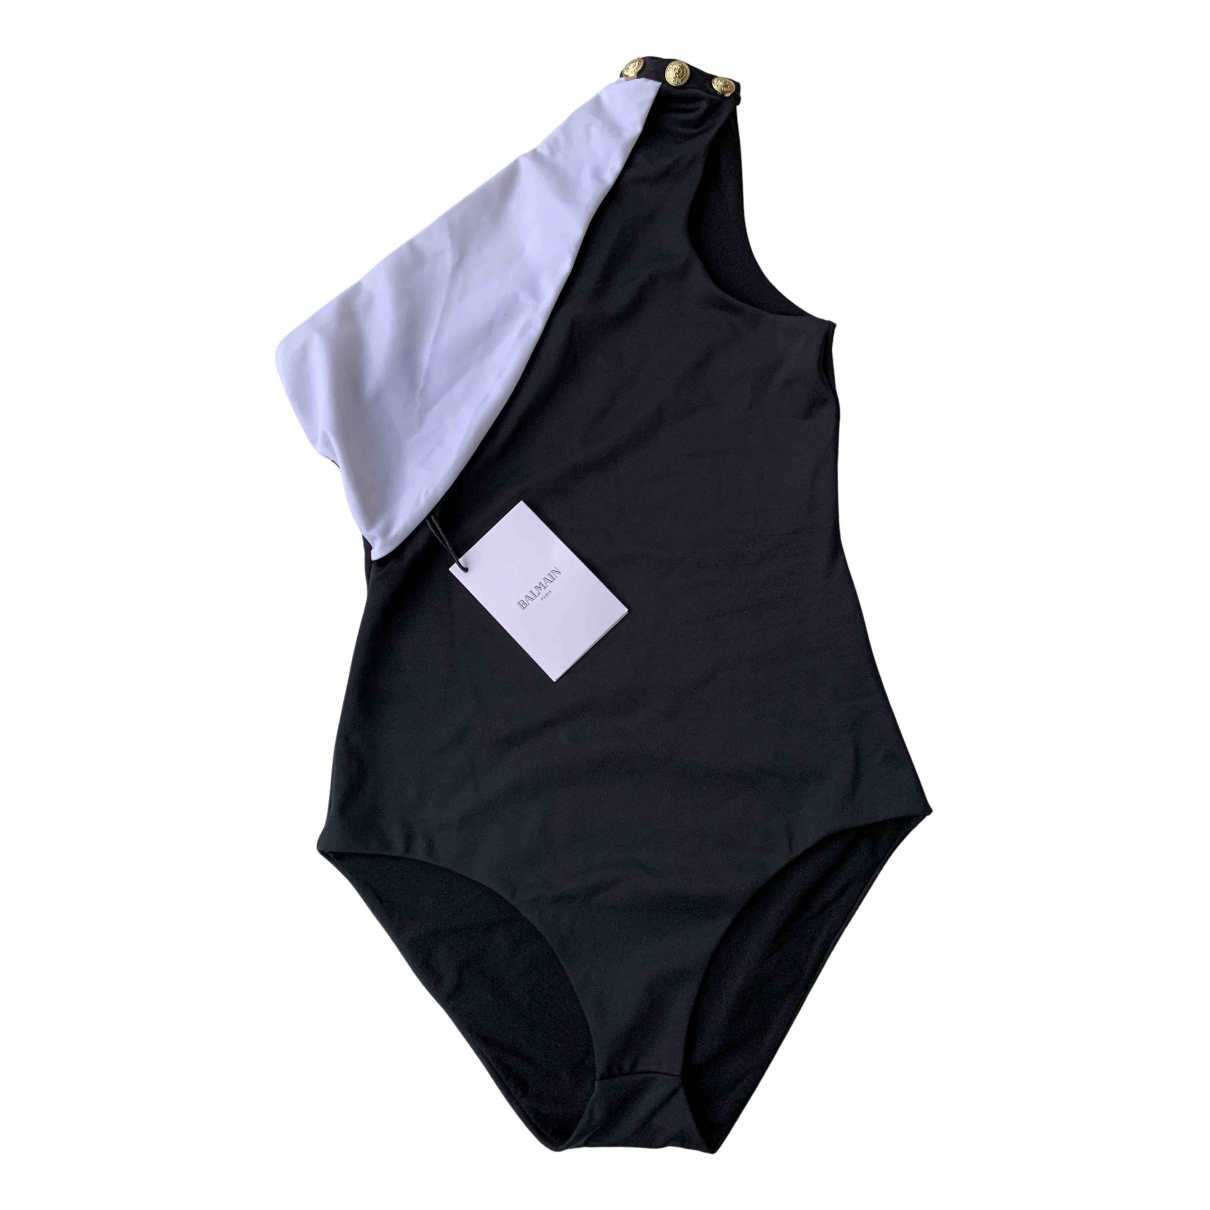 Balmain \N Badeanzug in  Schwarz Polyester